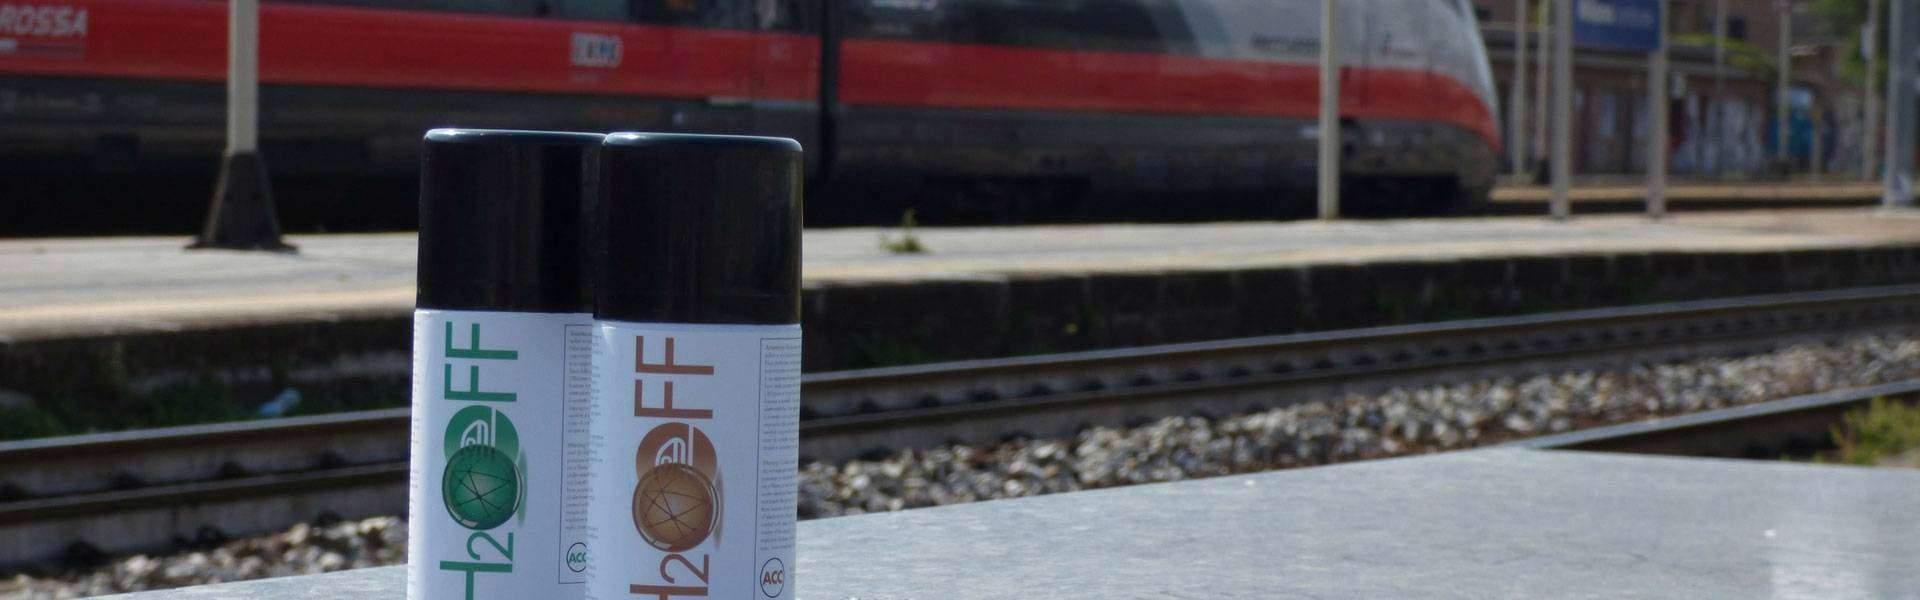 H2OFF Railway